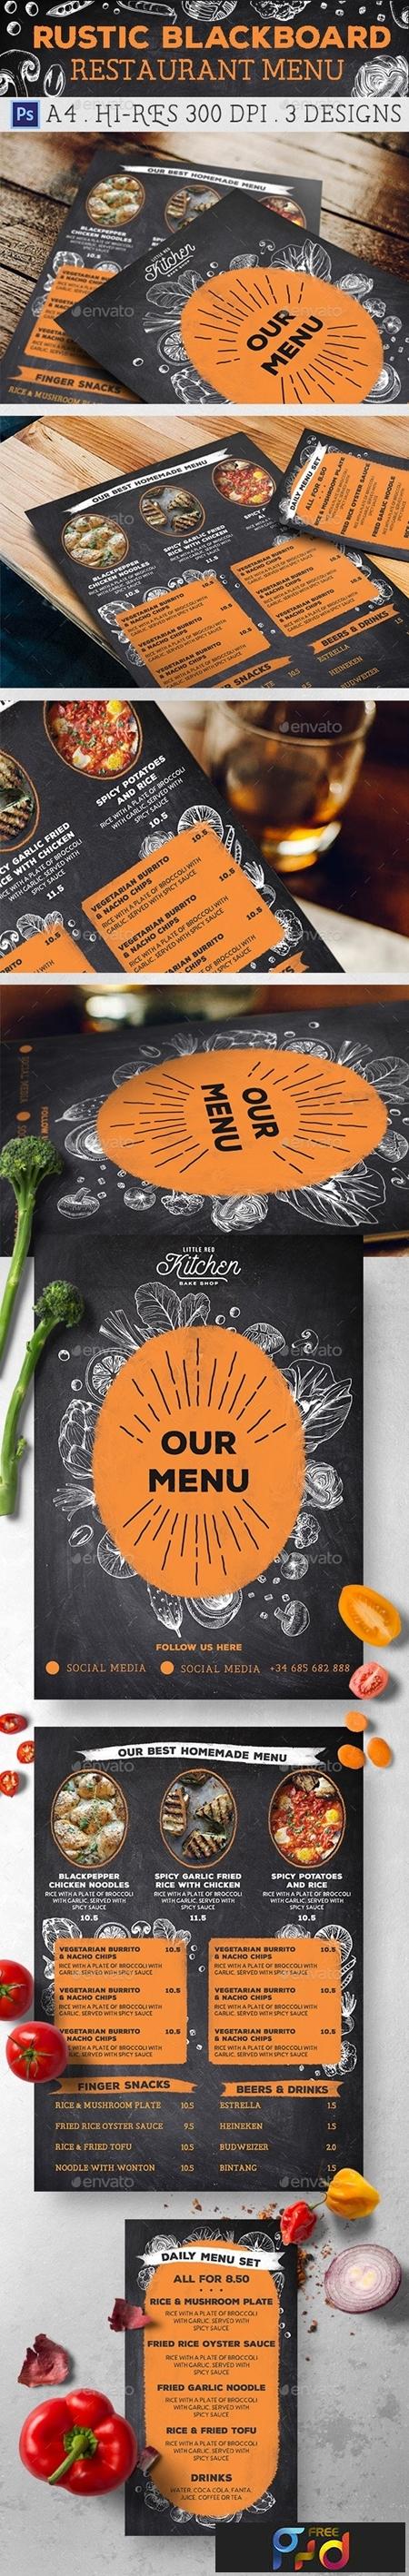 Rustic Blackboard Restaurant Menu 21580955 1